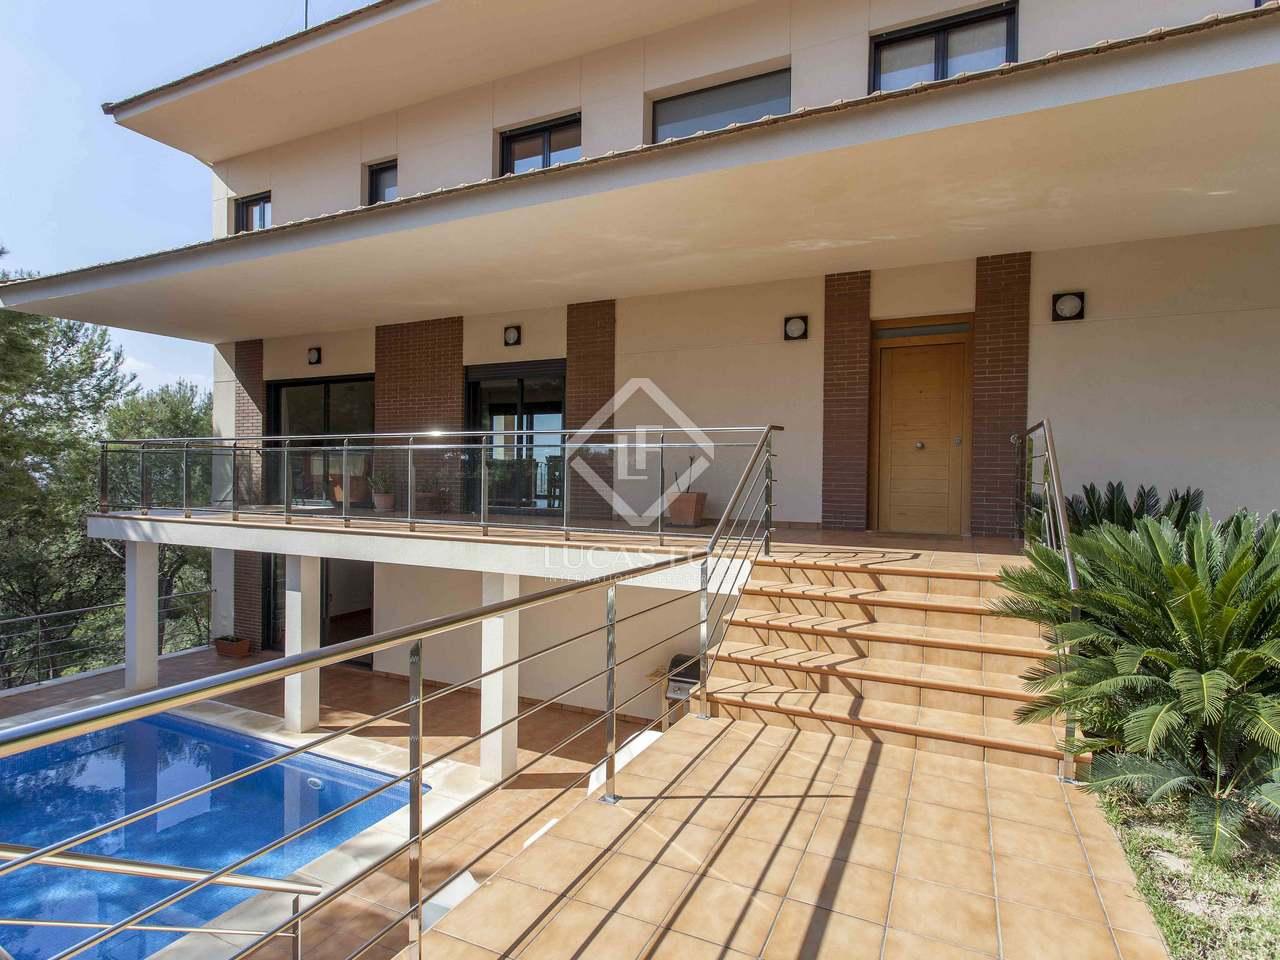 371 m² villa with 50 m² terrace for sale in El Bosque